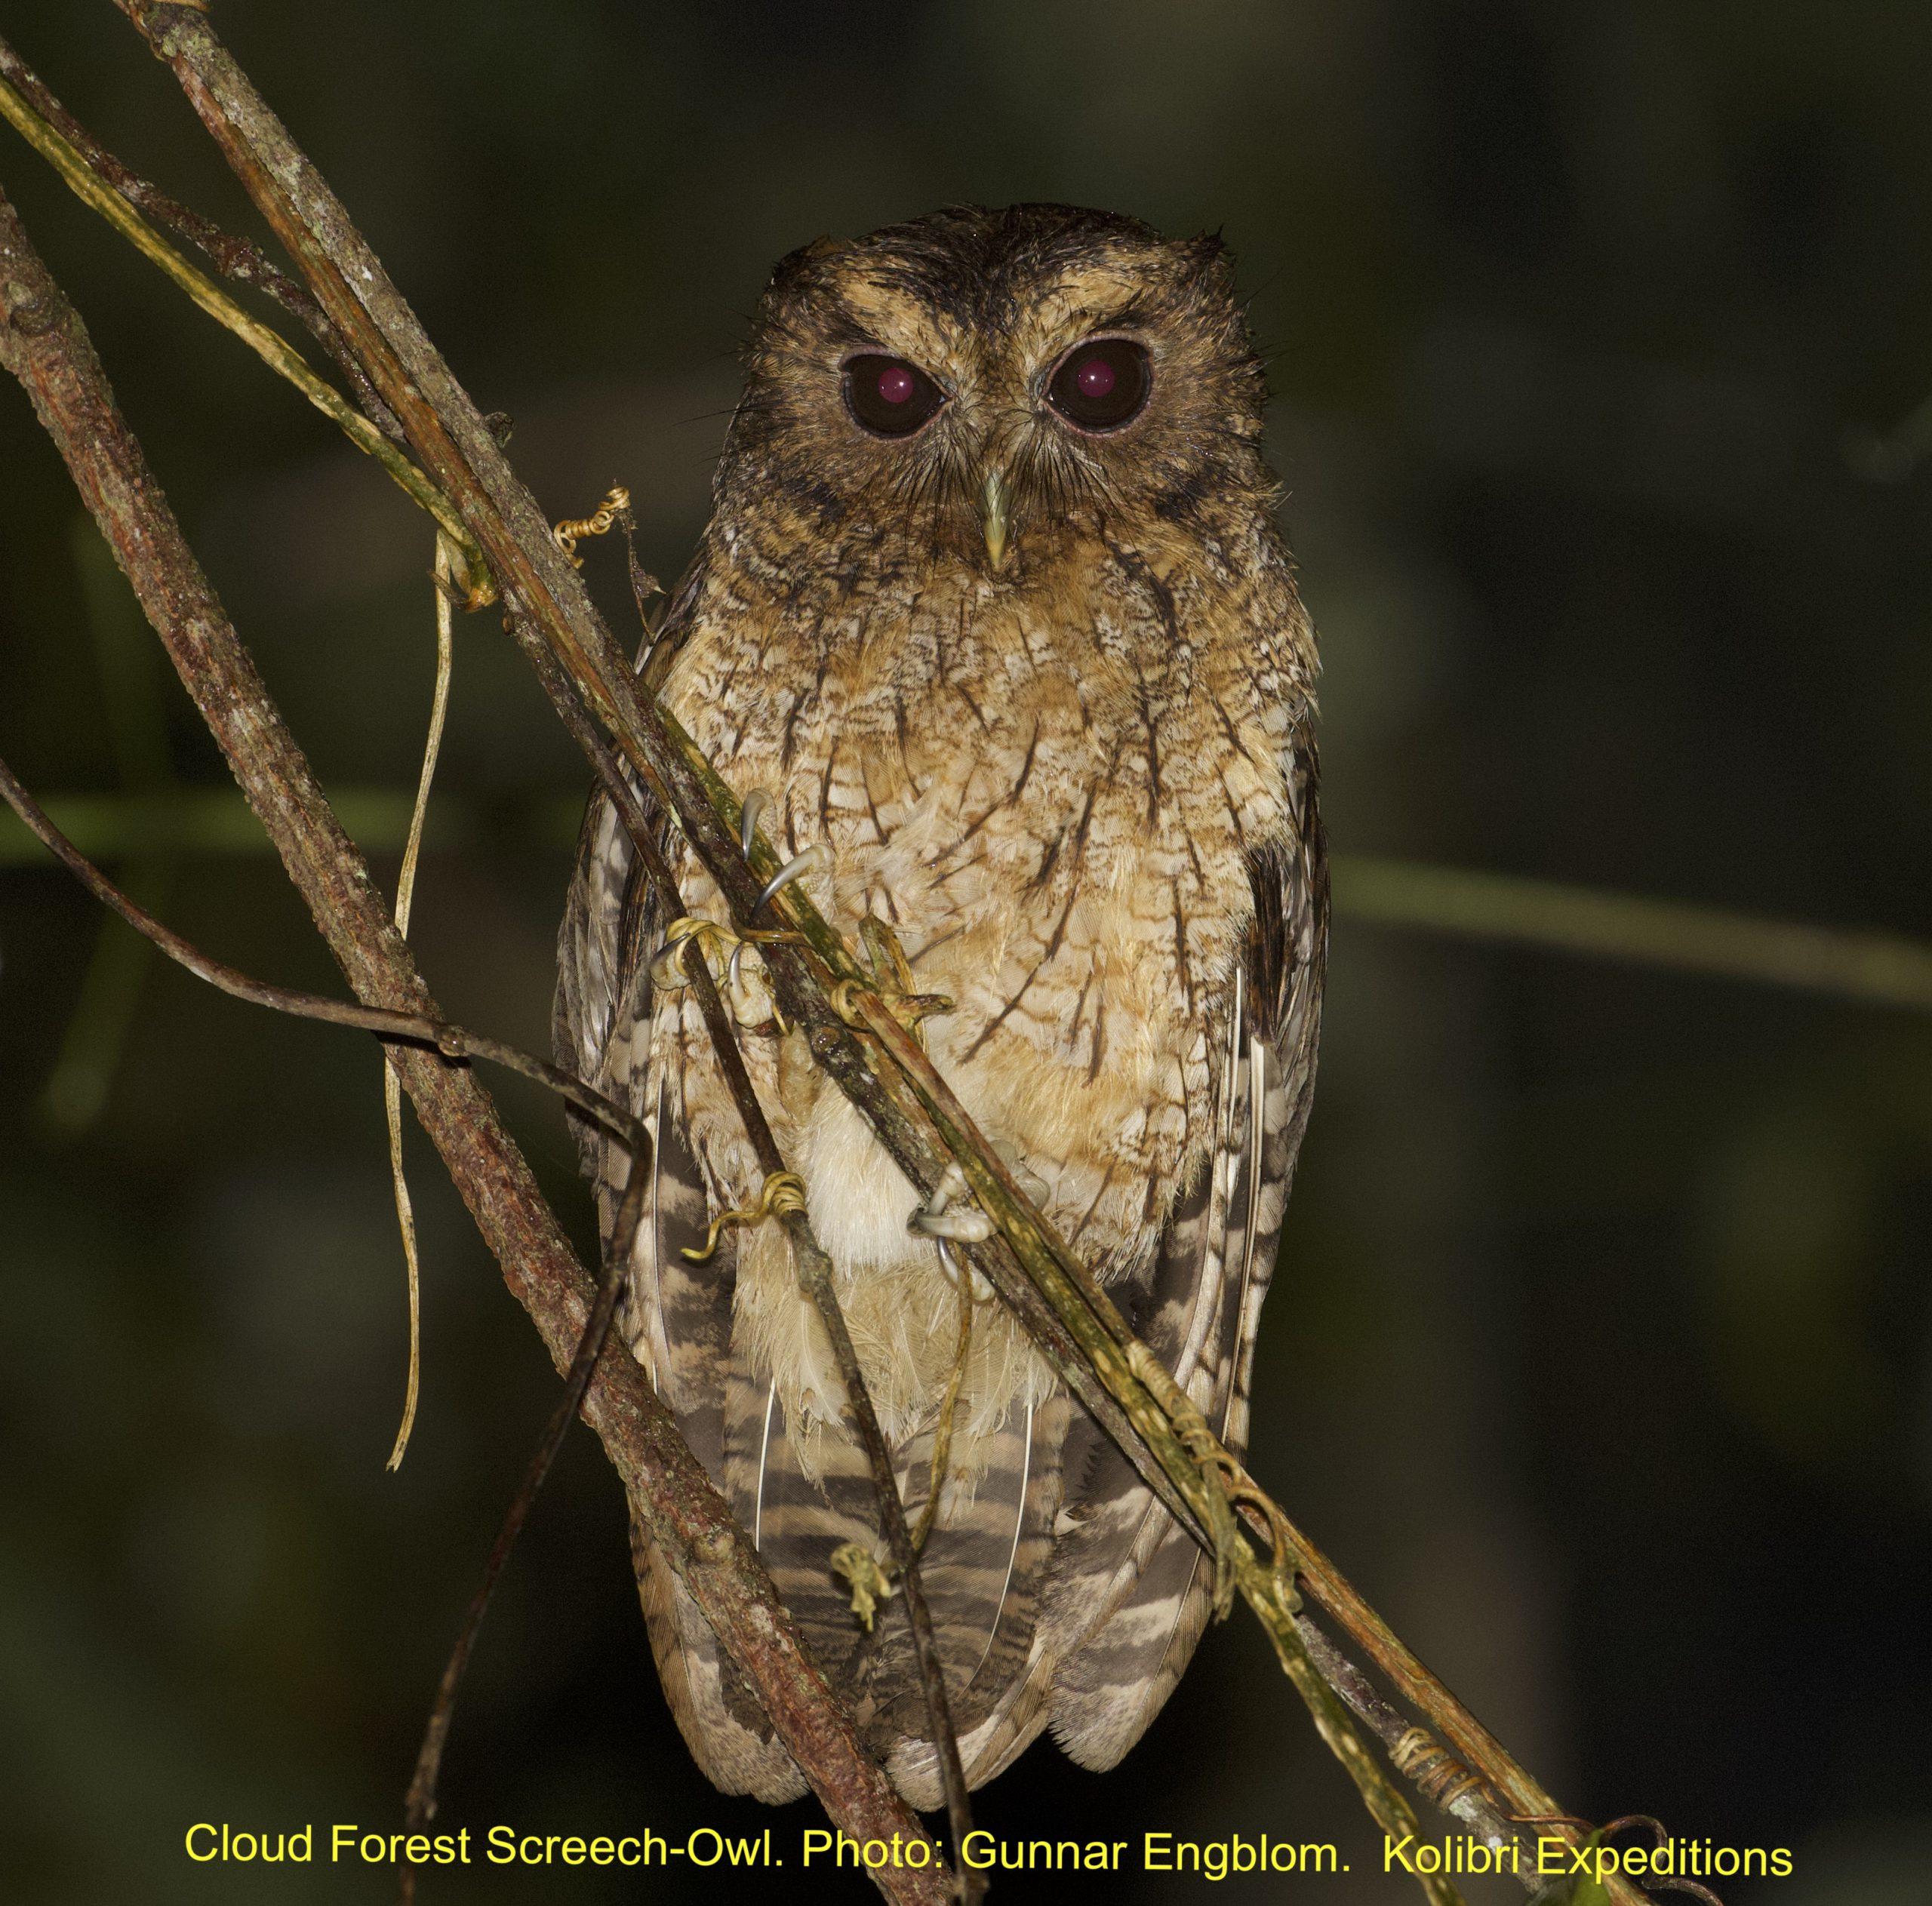 Cloud-forest Screech-Owl - Hacienda Armorique. Gunnar Engblom